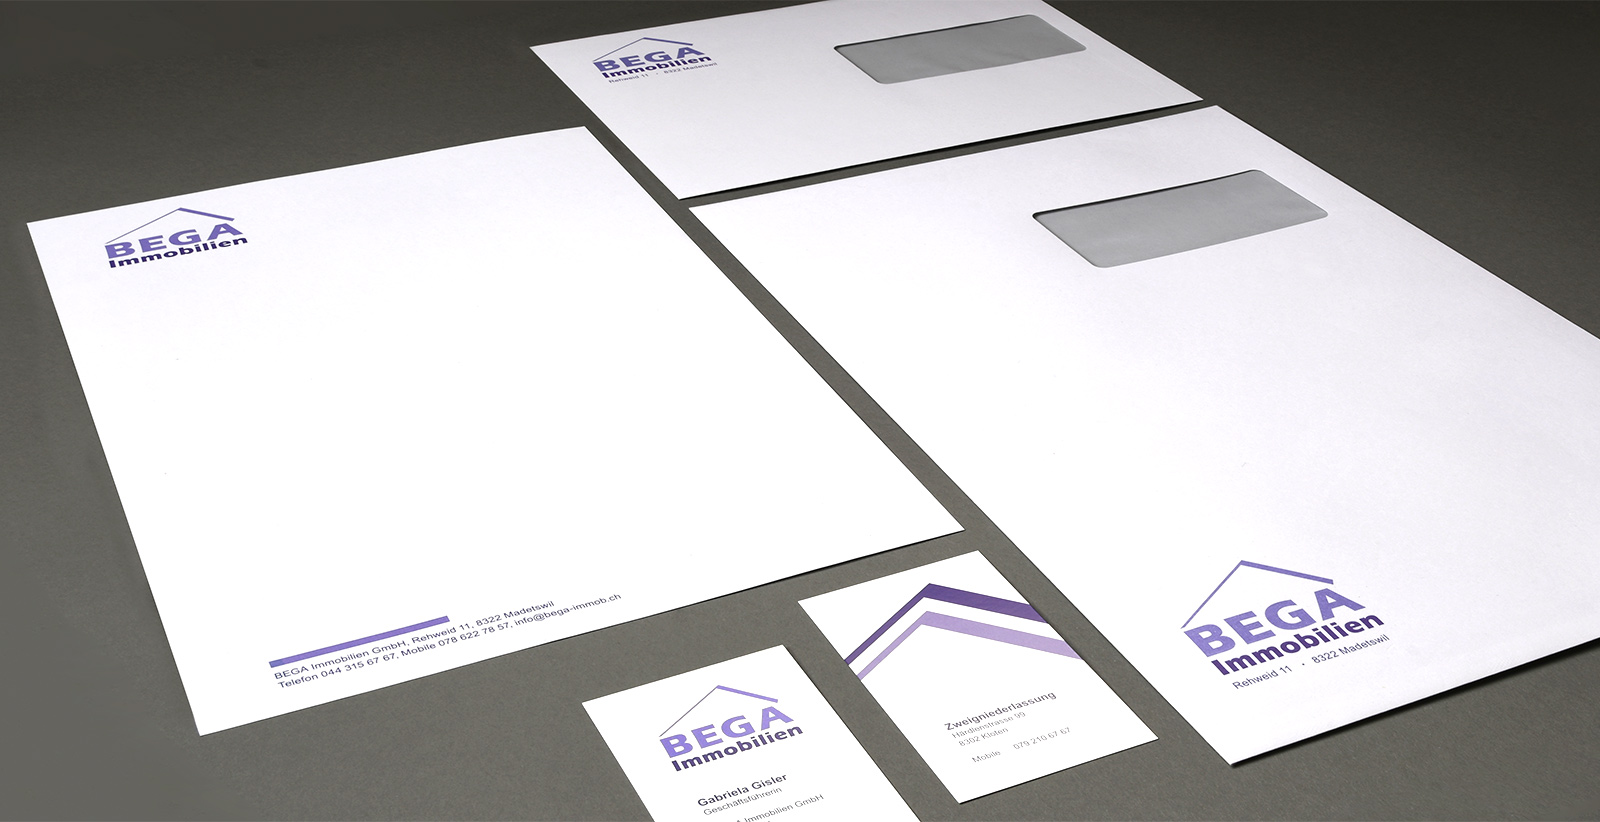 content-referenzen-details-ela-immobilien-briefschaften-desktop